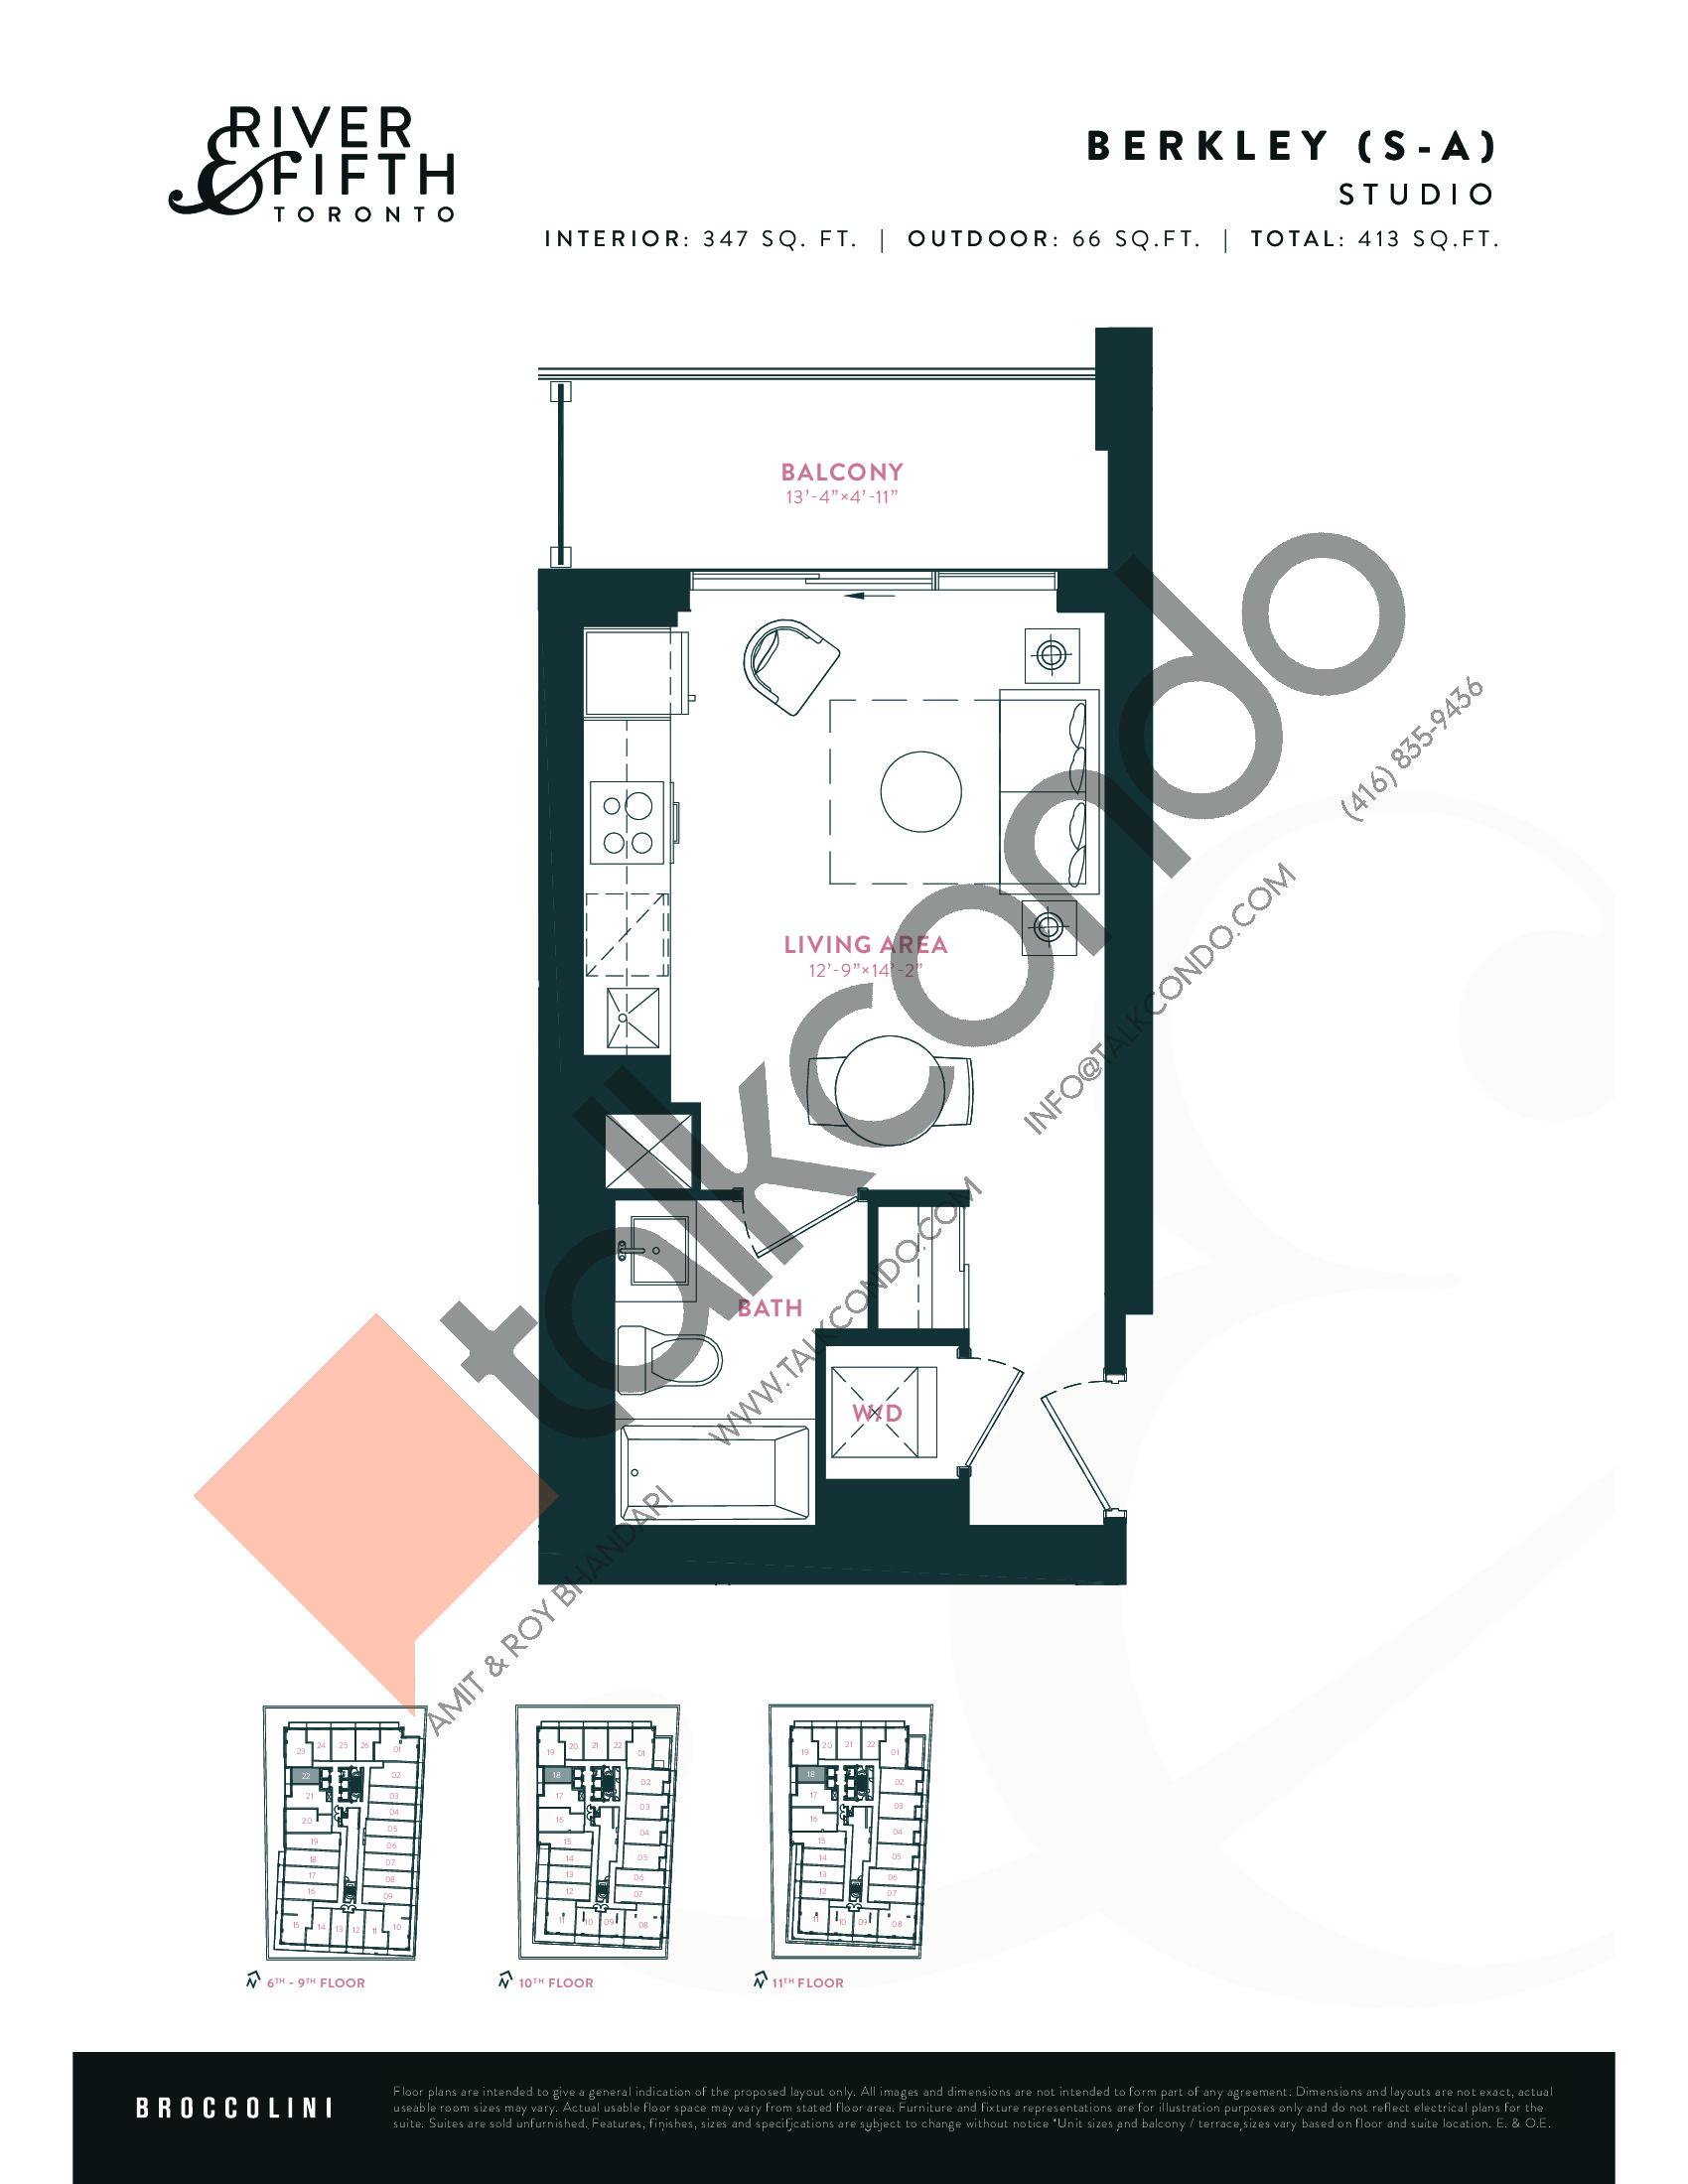 Berkley (S-A) Floor Plan at River & Fifth Condos - 347 sq.ft